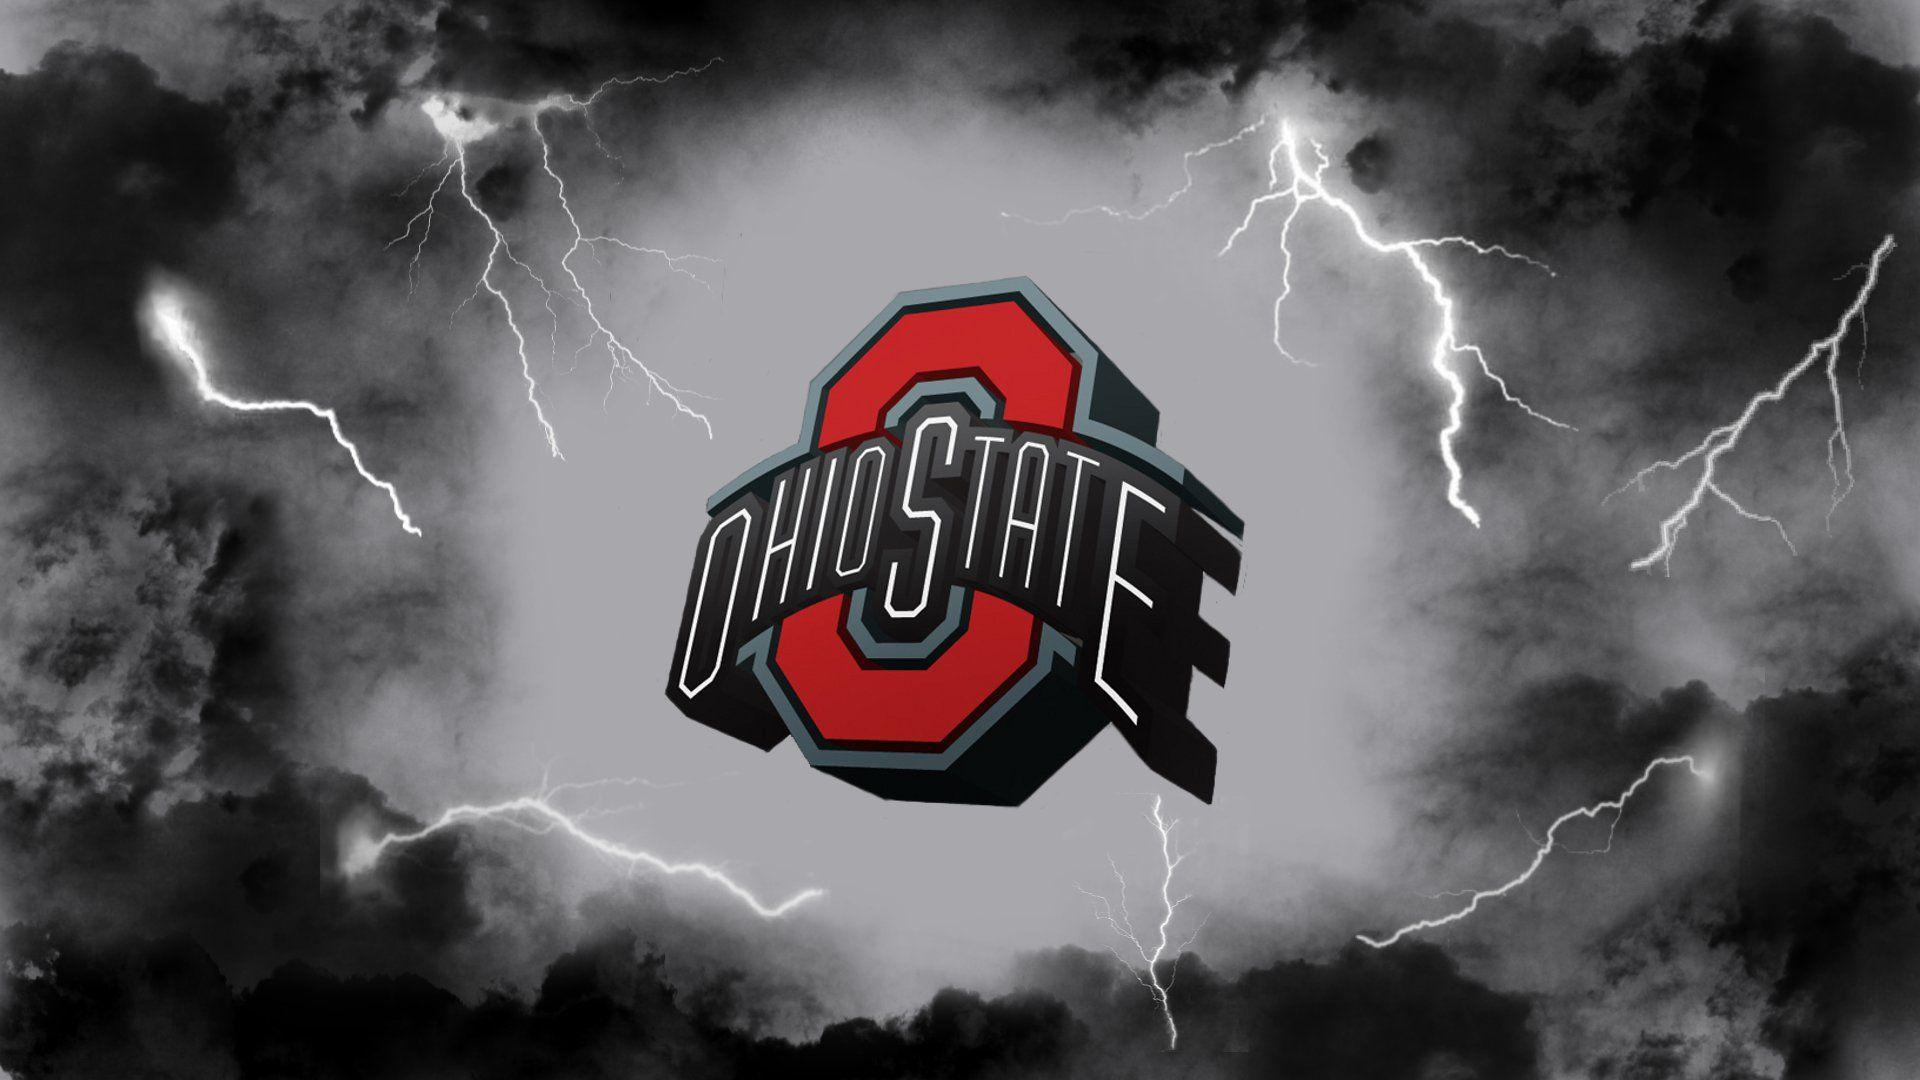 Pin by nikki falor on osu buckeyes ohio state wallpaper ohio state basketball ohio state - Ohio state football wallpaper ...